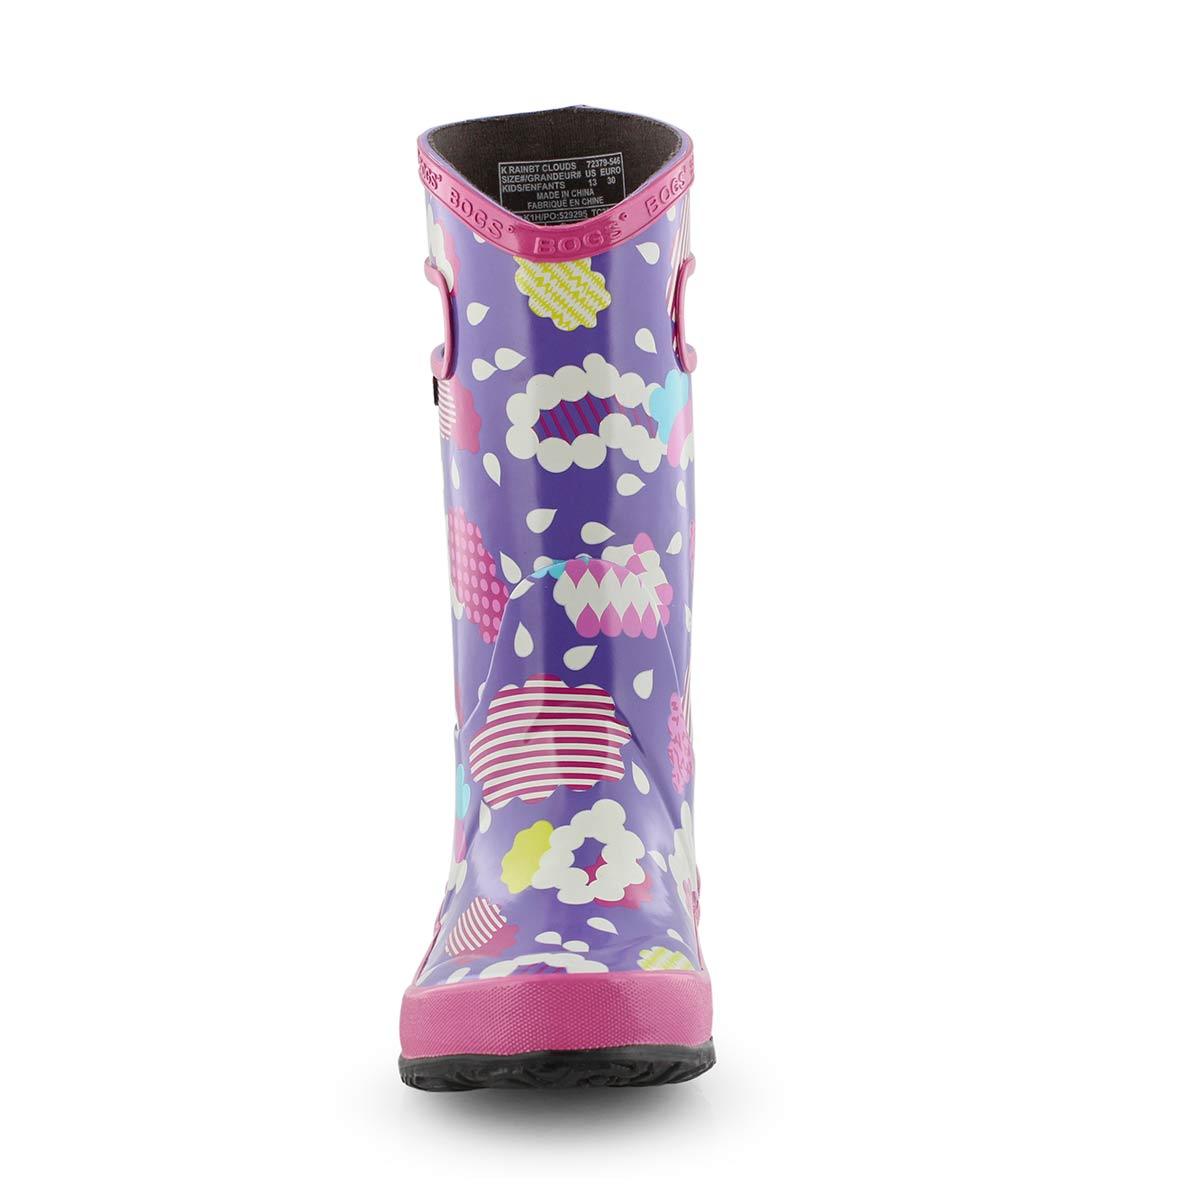 c03e5c68a19 Girls | Rainwear | SoftMoc.com bard